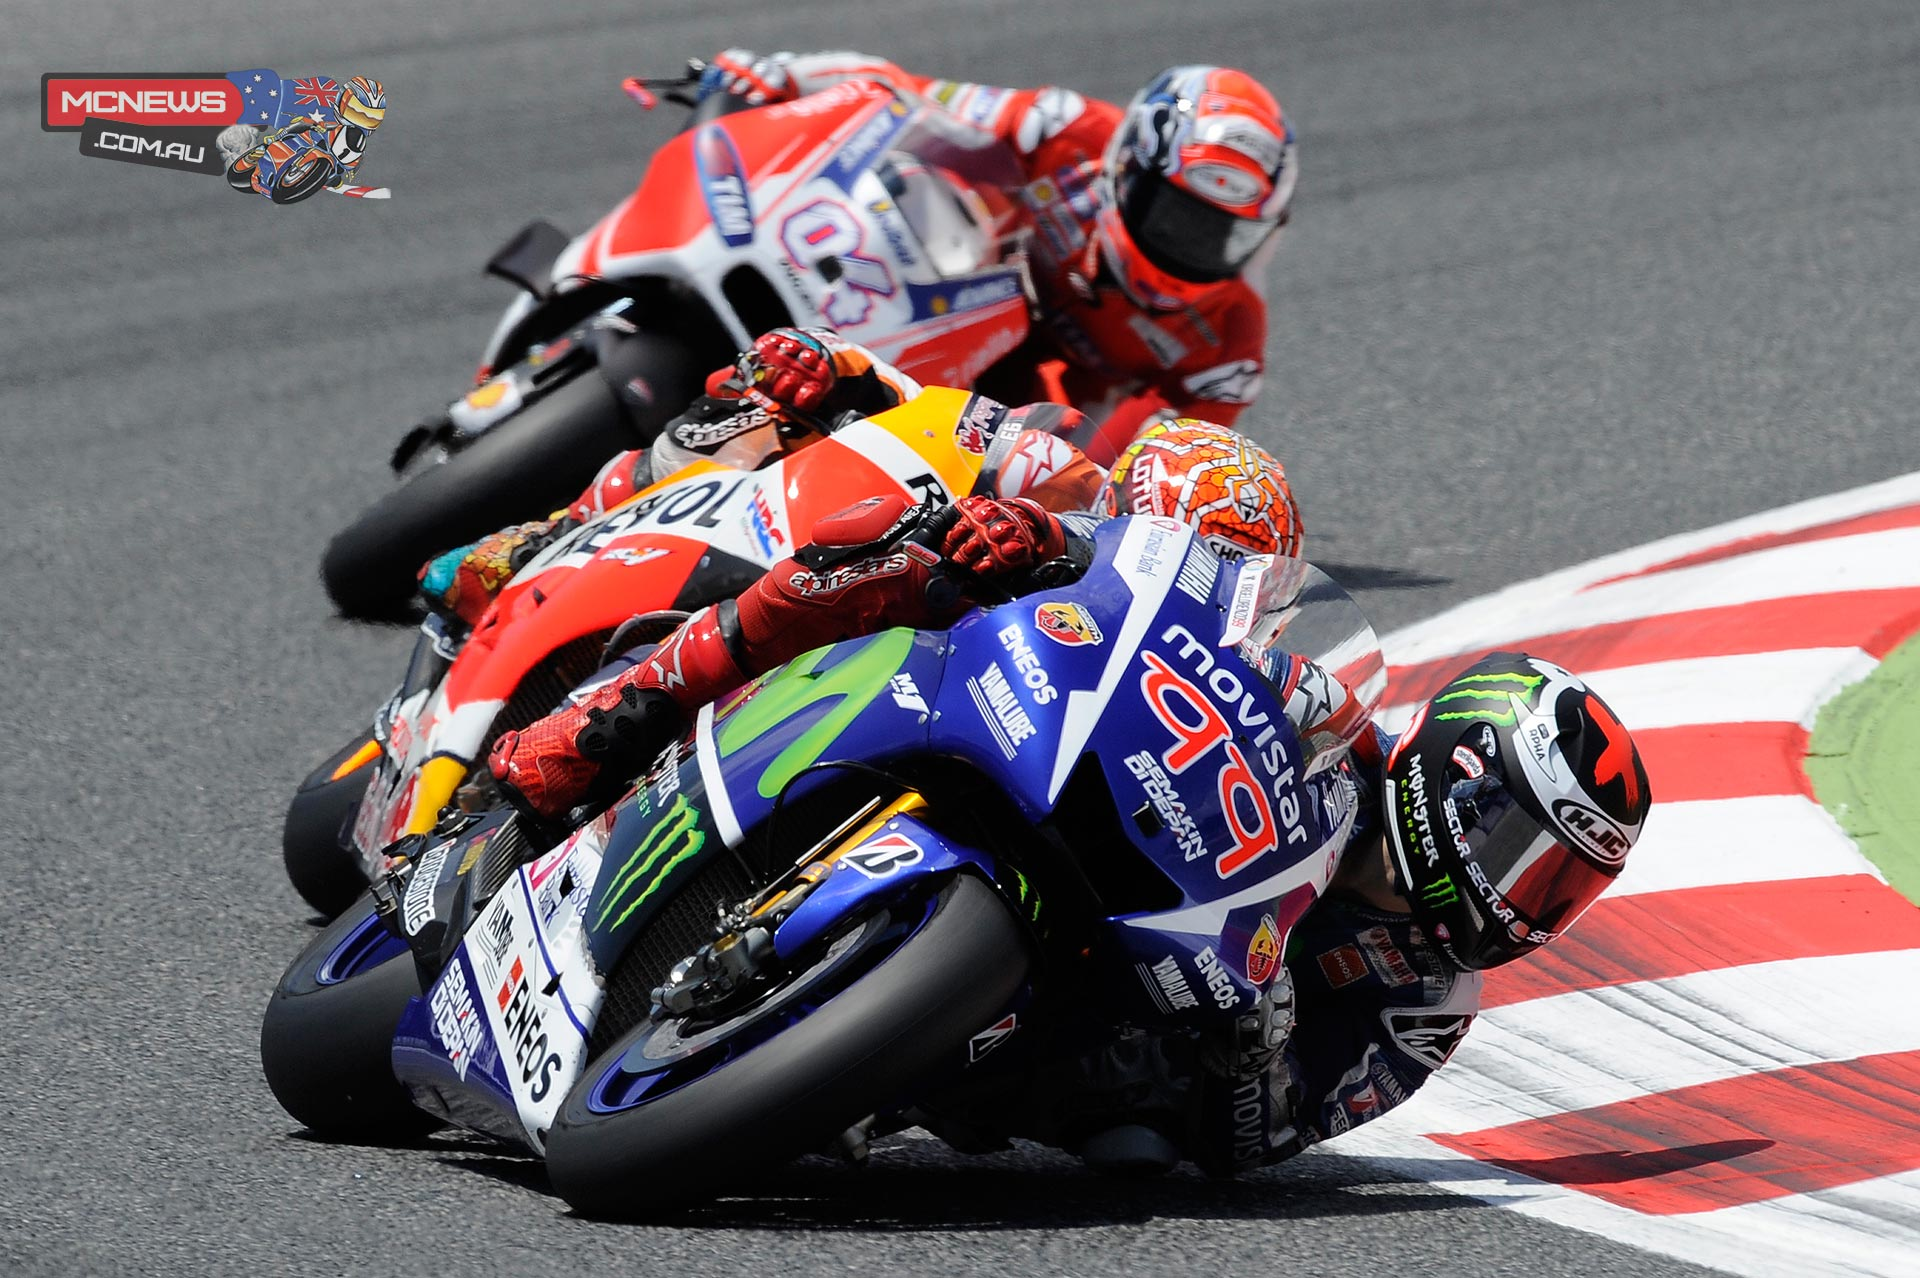 Jorge Lorenzo leads Marc Marquez and Andrea Dovizioso at Catalunya MotoGP 2015